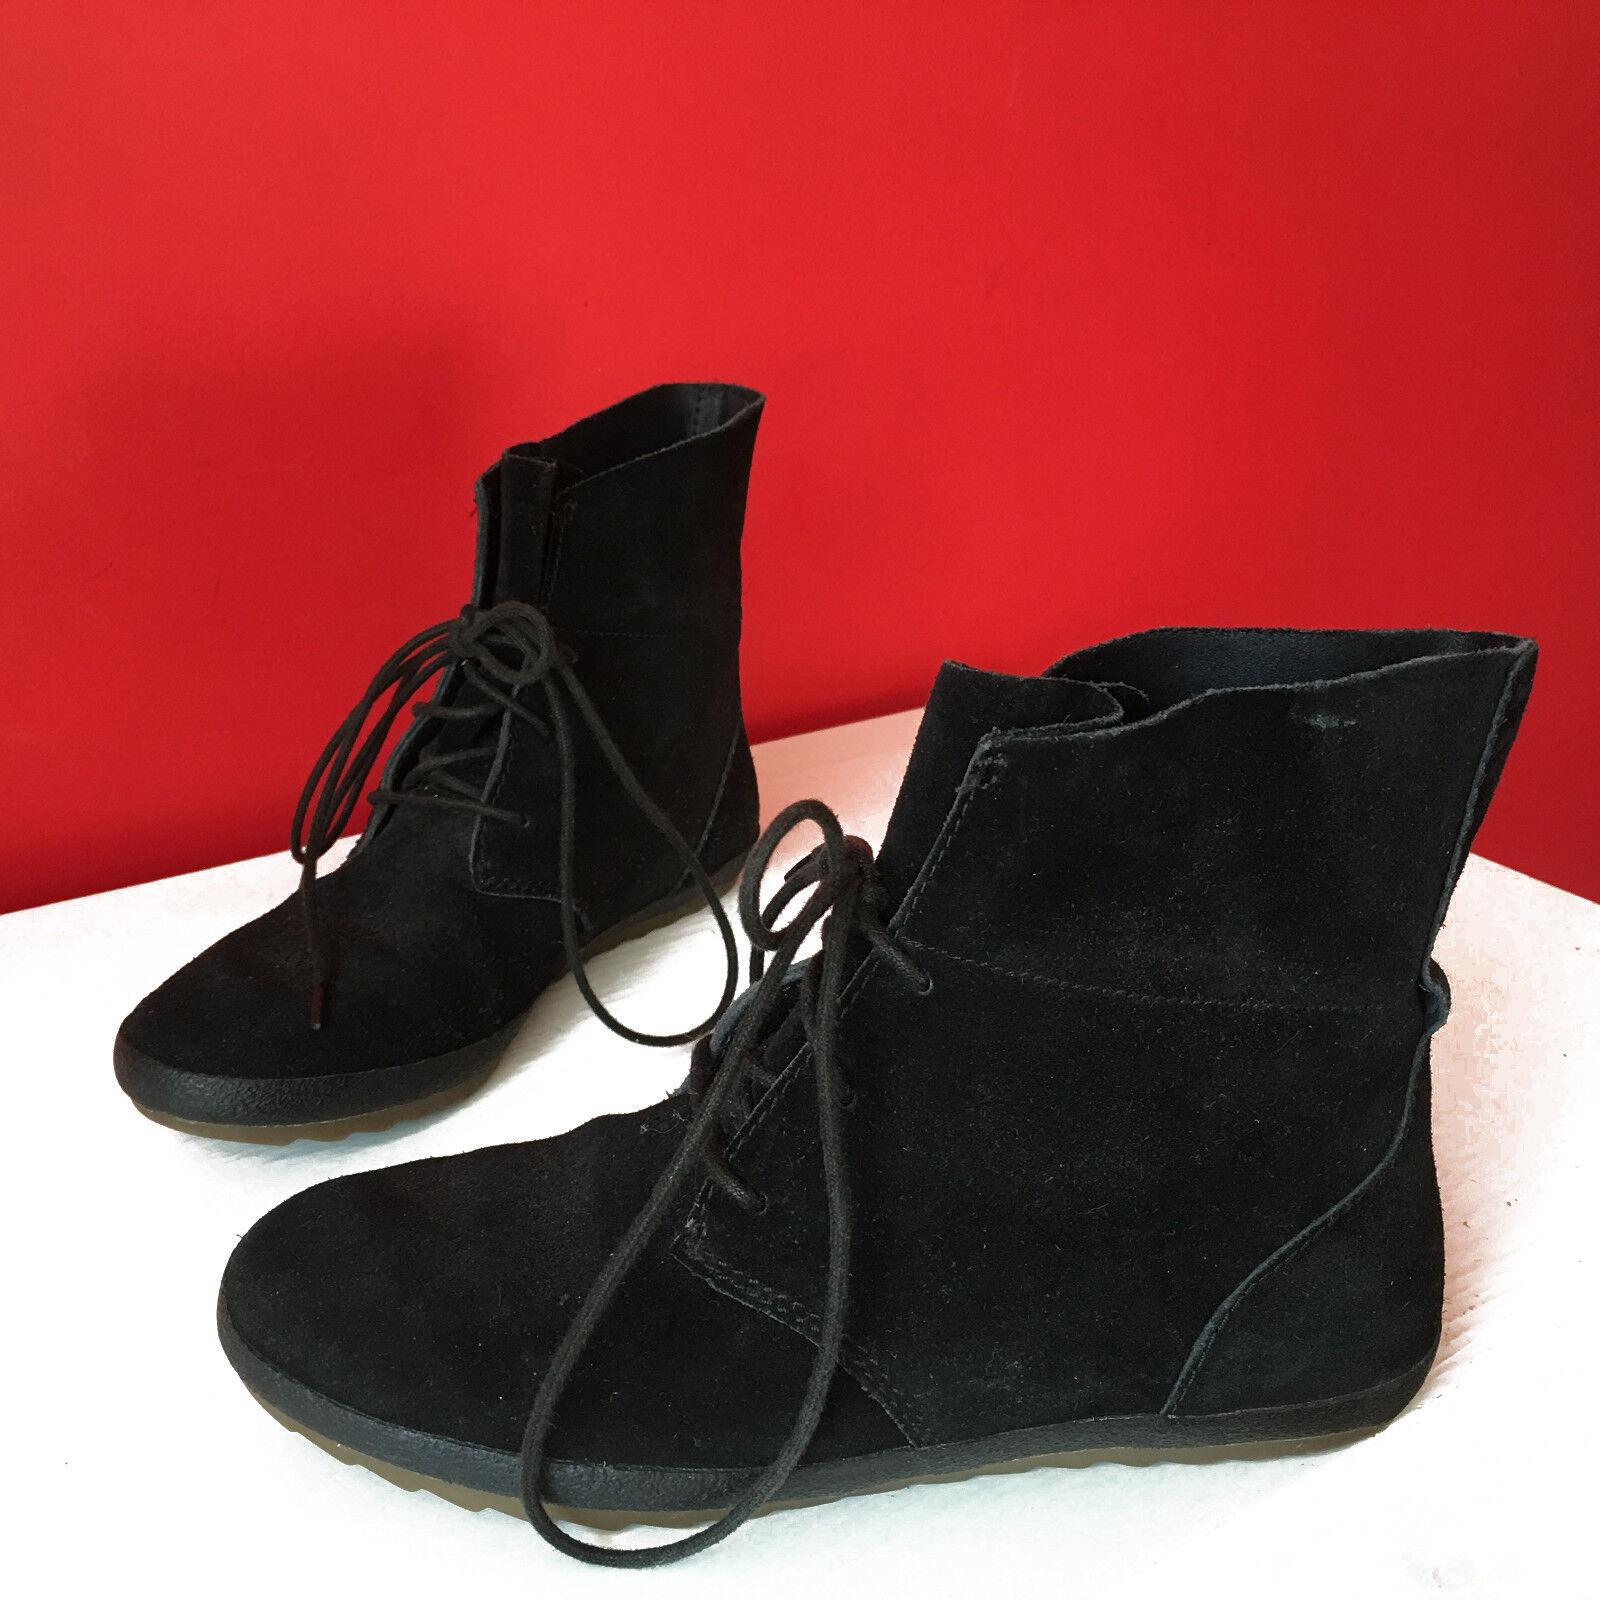 Clarks Black Leather Suede Lace Up Flat Heel Boots Size UK 3 D EUR 36